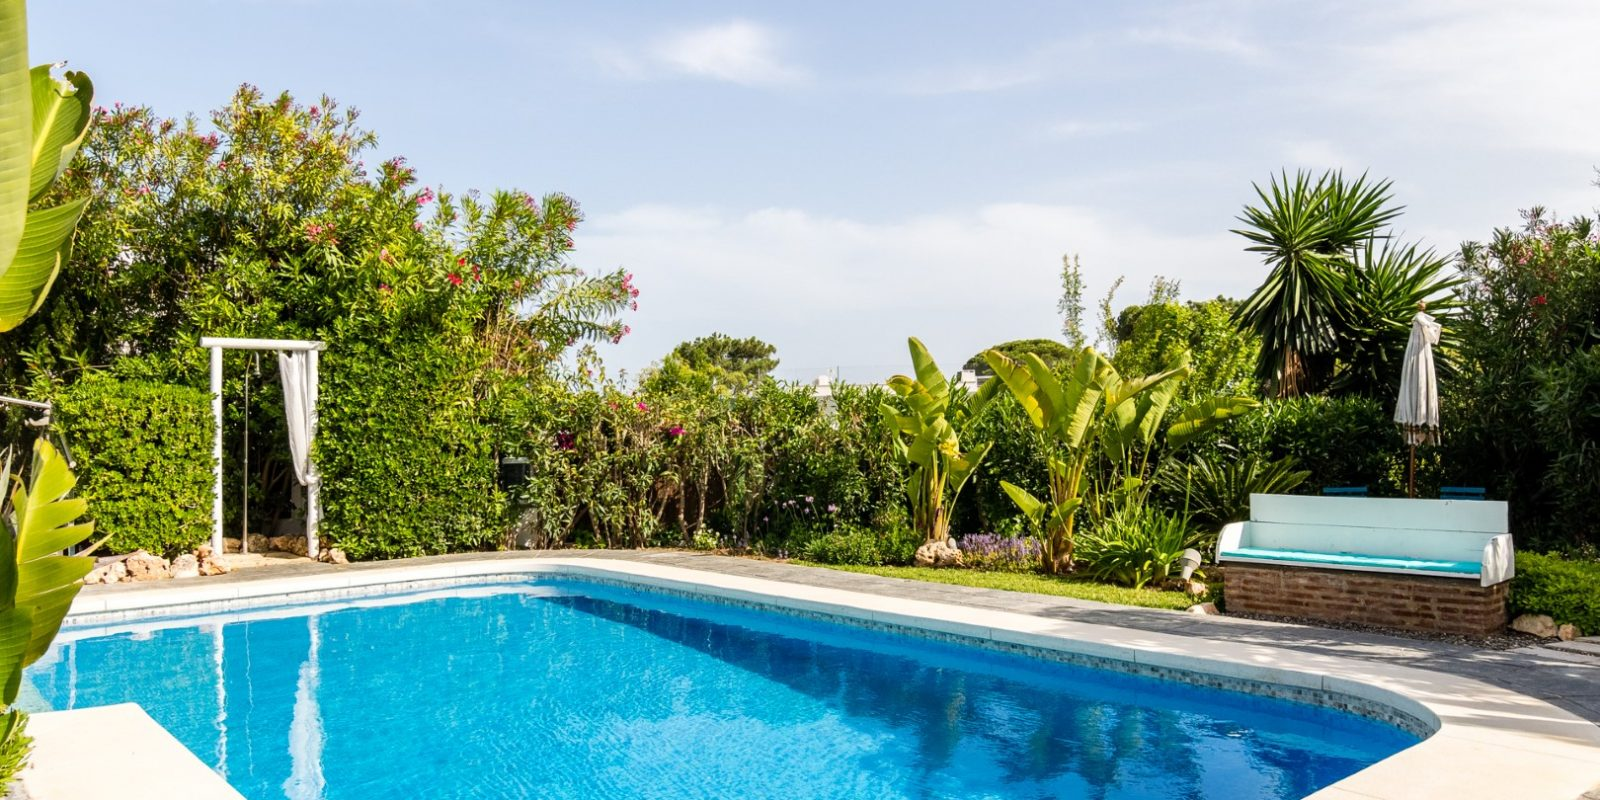 2017.06.01 - Just Rent Marbella - Villa Marlin - (3 of 6) (Large)